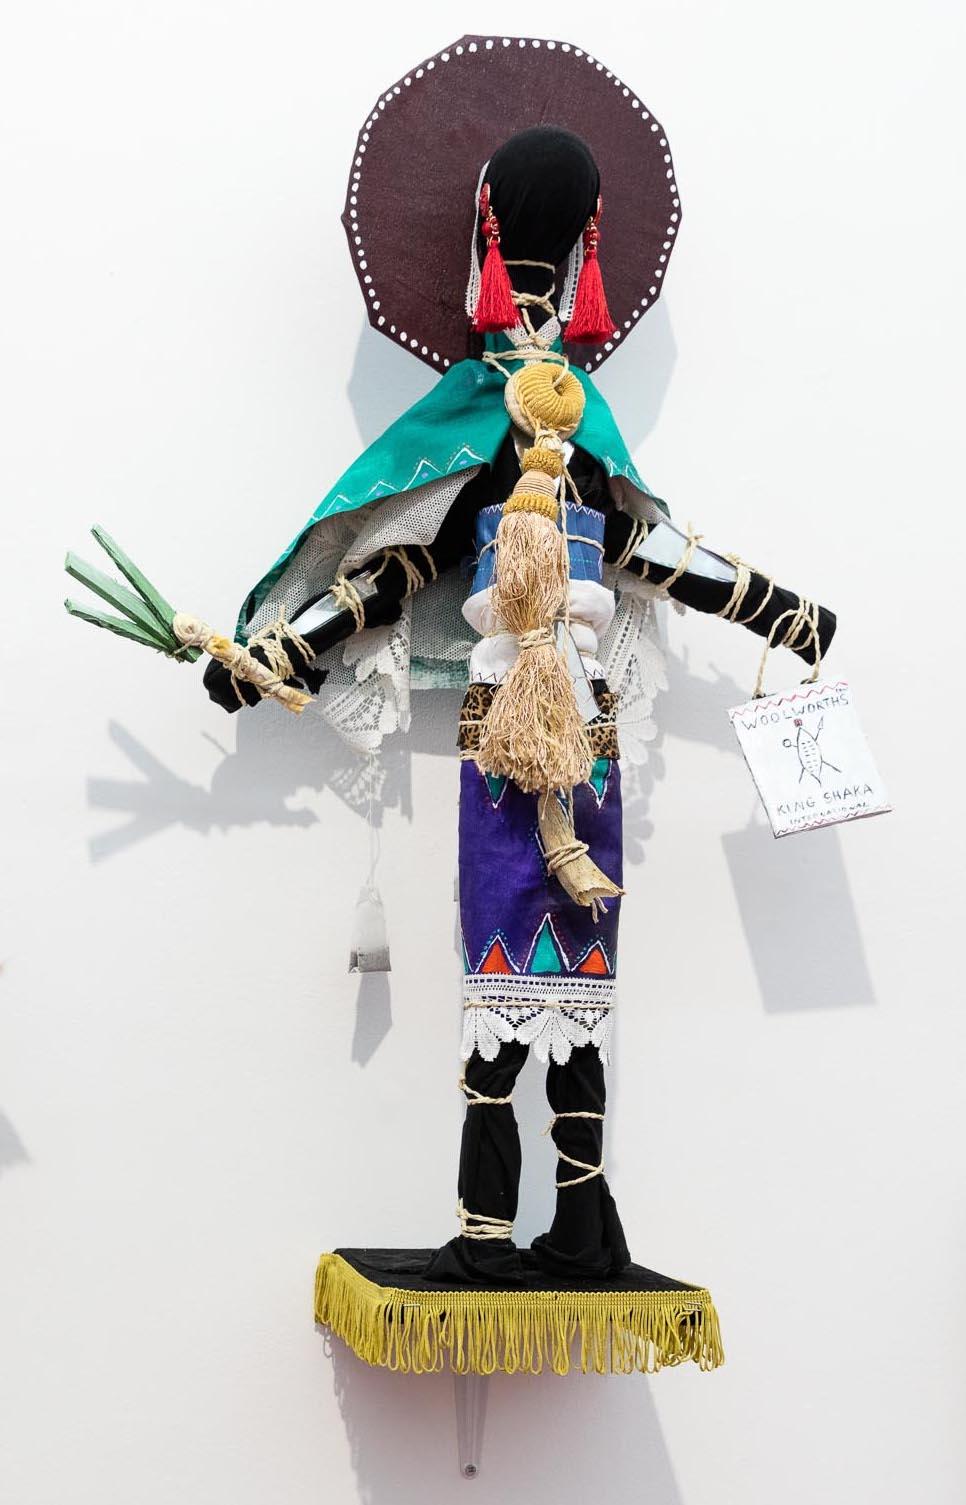 Andrew Gilbert: 'Zulu Sangoma Doll - with Leek Phone', 2018, mixed media, 80 x 50 x 20 cm